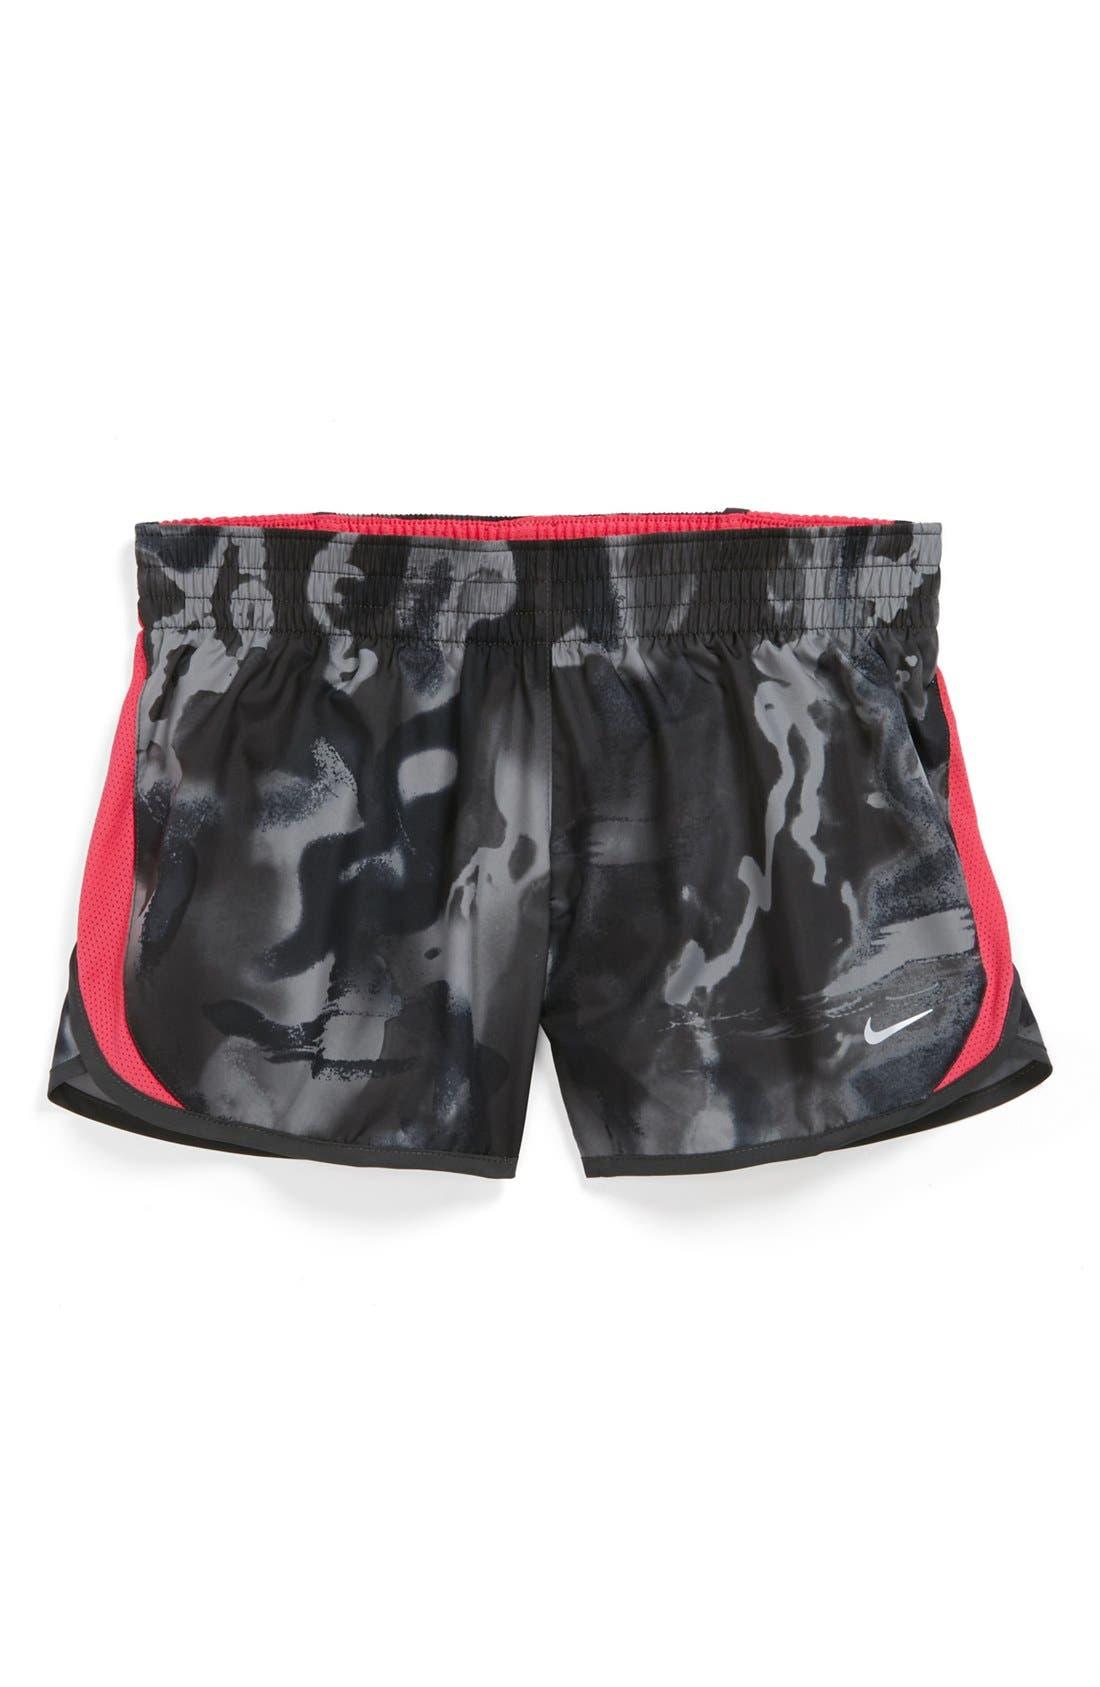 Alternate Image 1 Selected - Nike 'Dash' Dri-FIT Print Shorts (Big Girls)